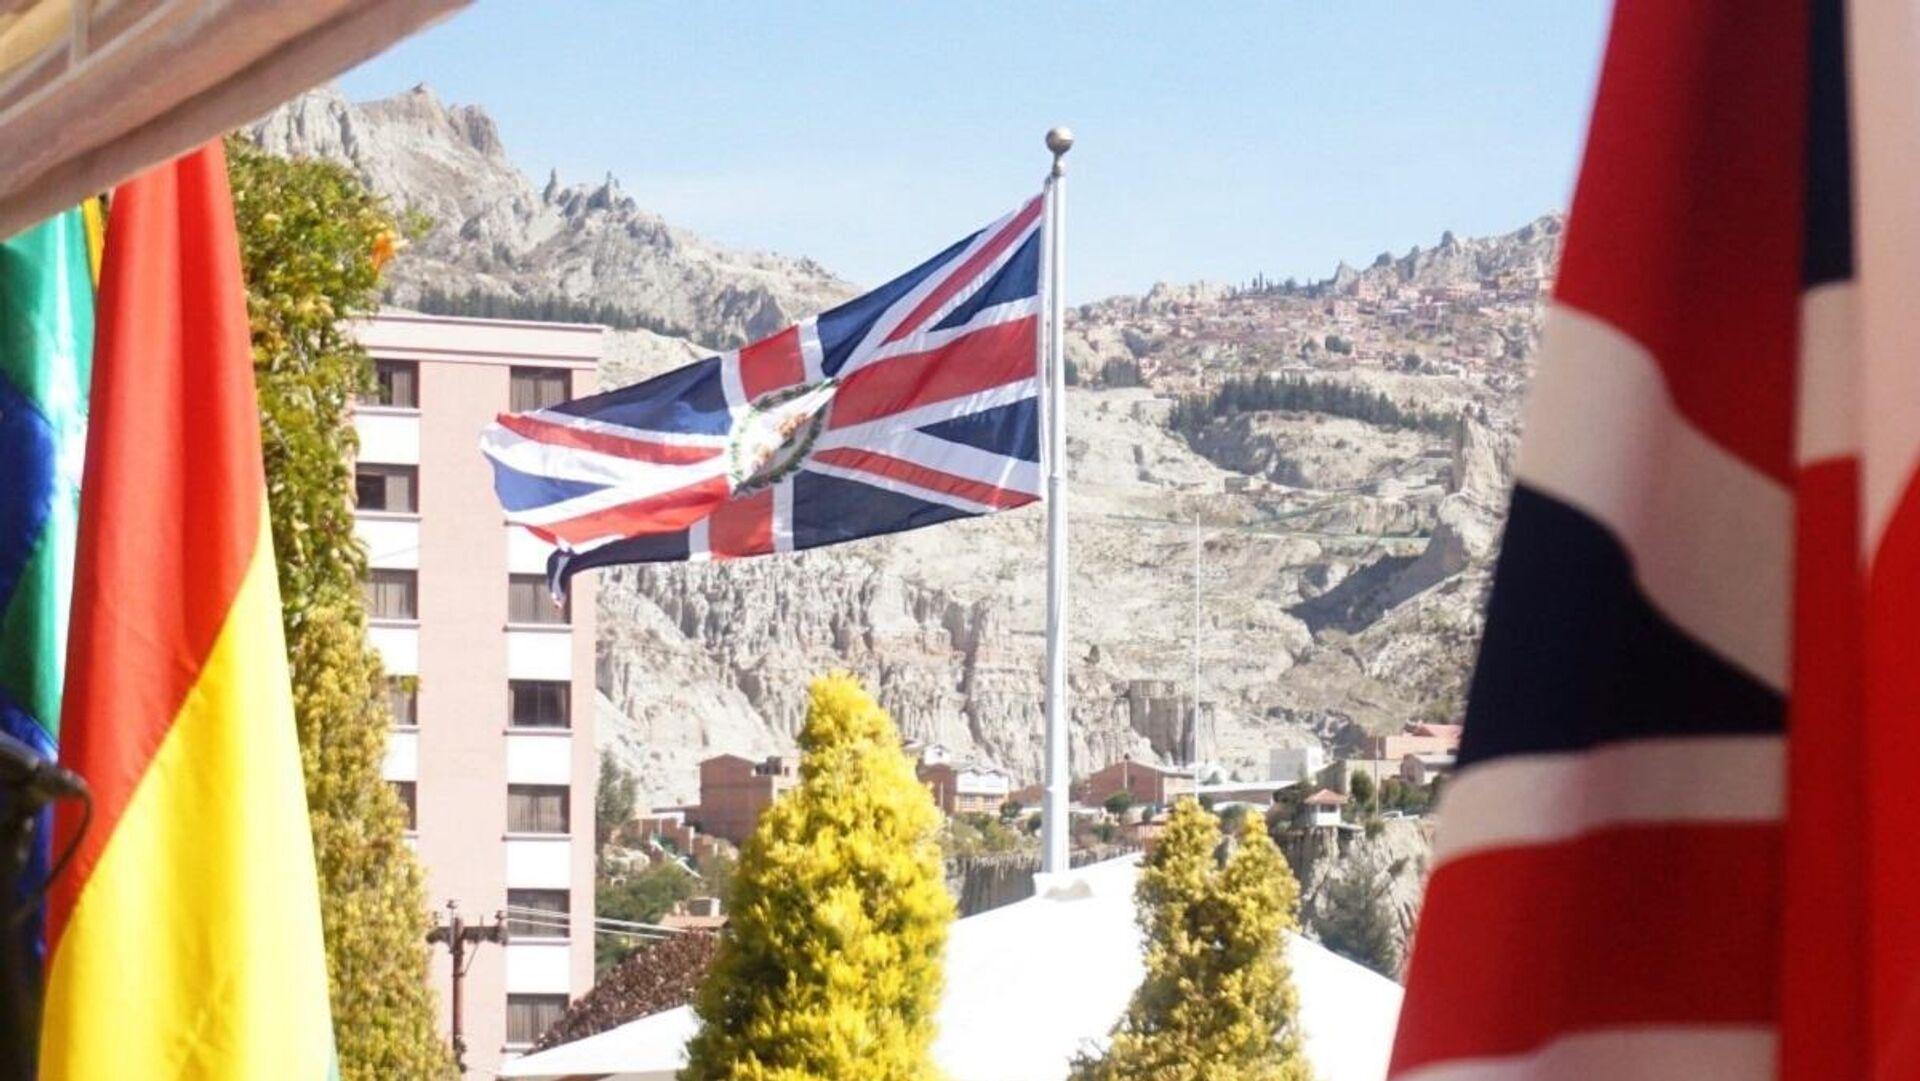 Embajada británica en La Paz, Bolivia - Sputnik Mundo, 1920, 12.03.2021